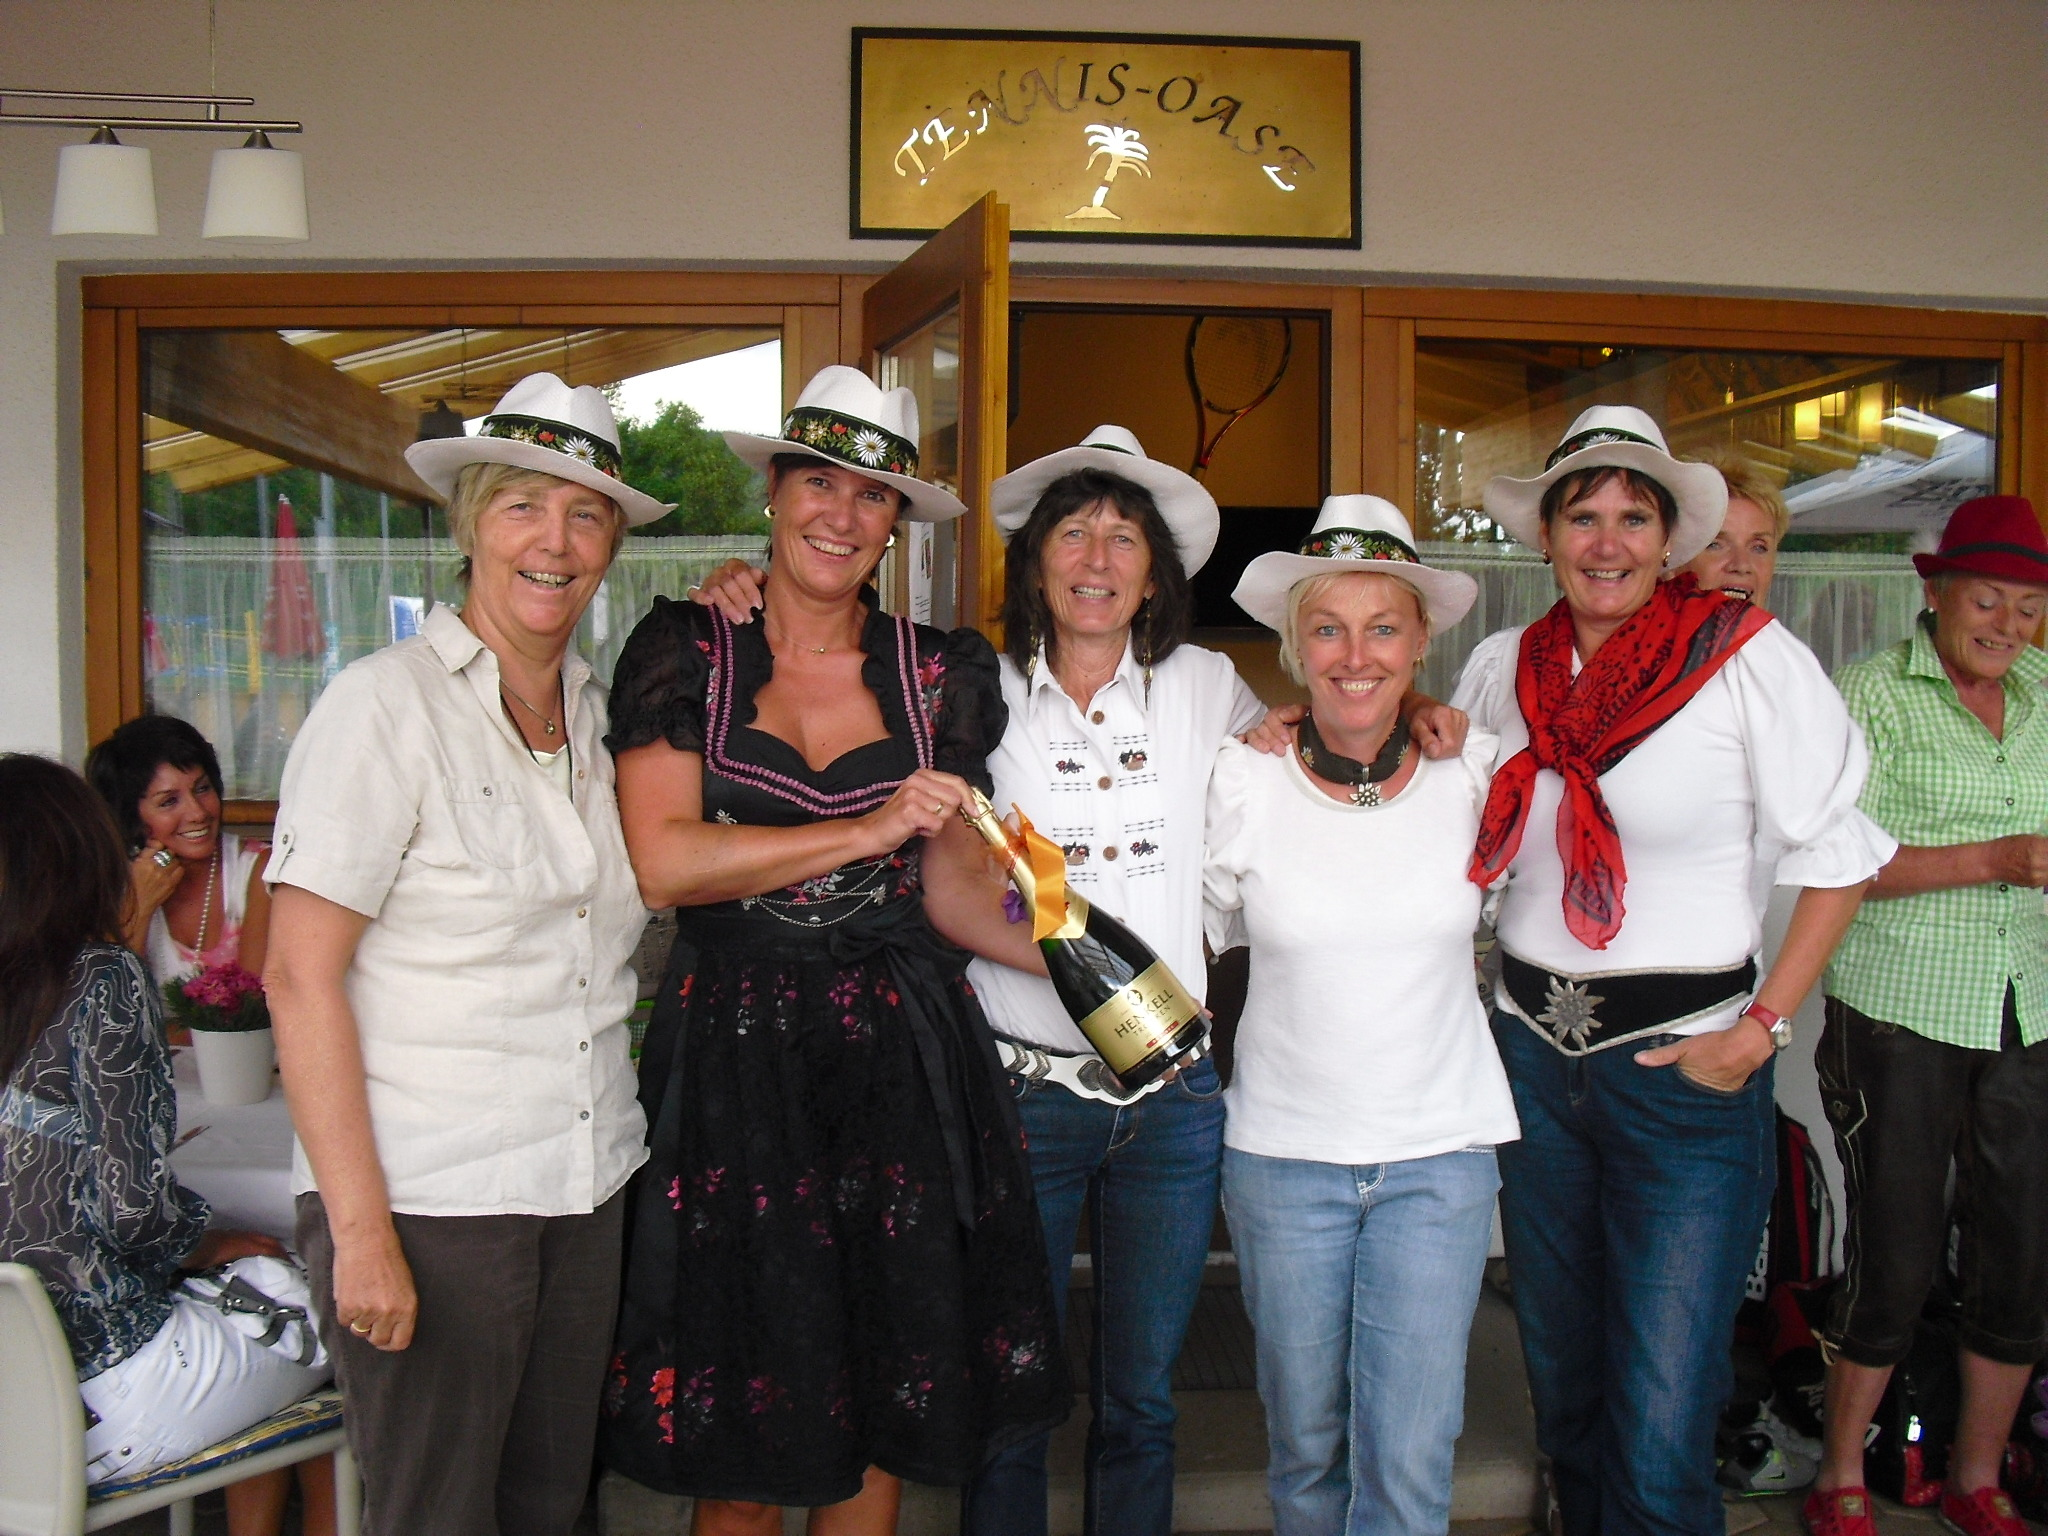 Bekanntschaften in Kematen in Tirol - Partnersuche